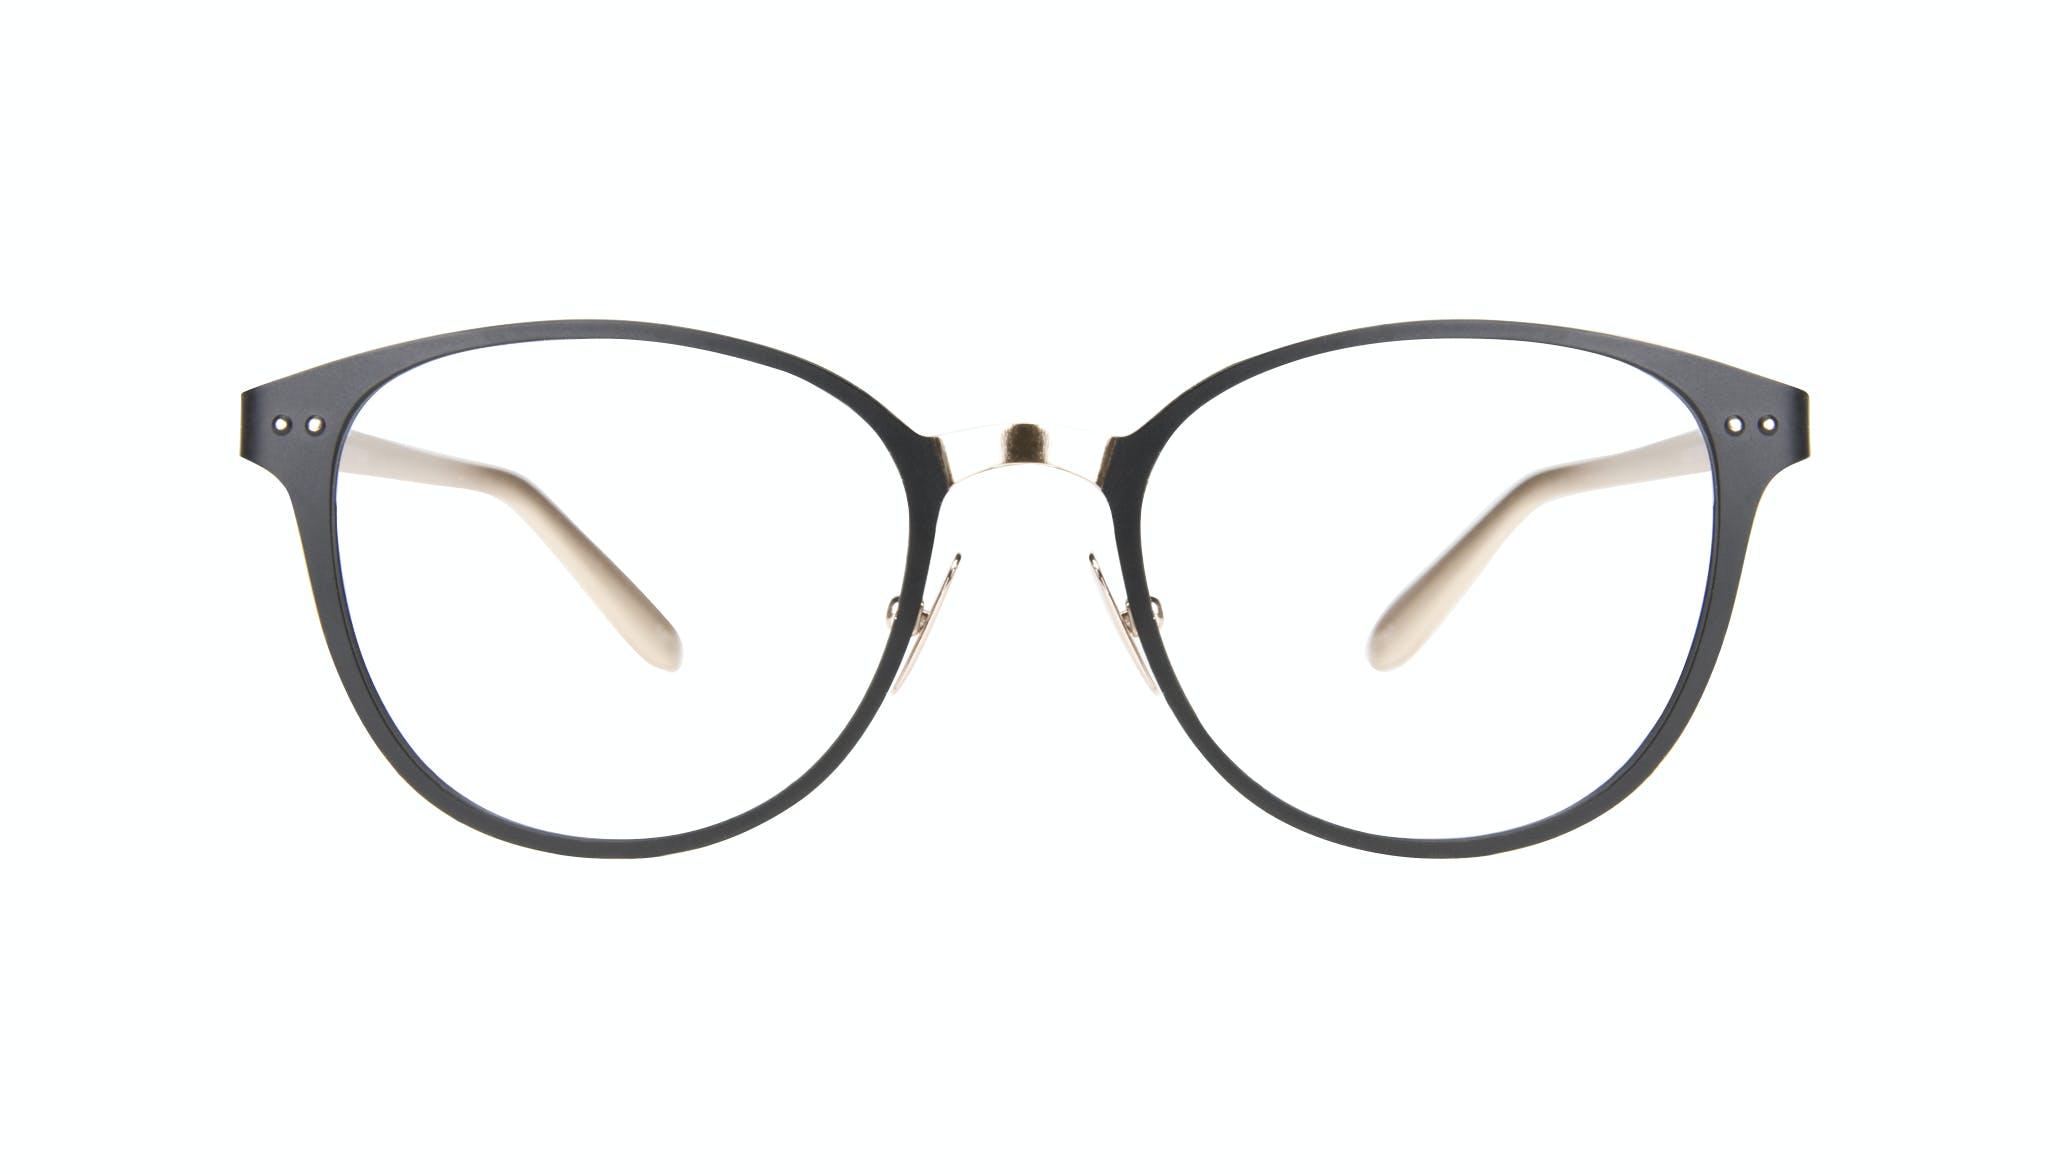 Affordable Fashion Glasses Rectangle Eyeglasses Women Kind Deep Gold Front